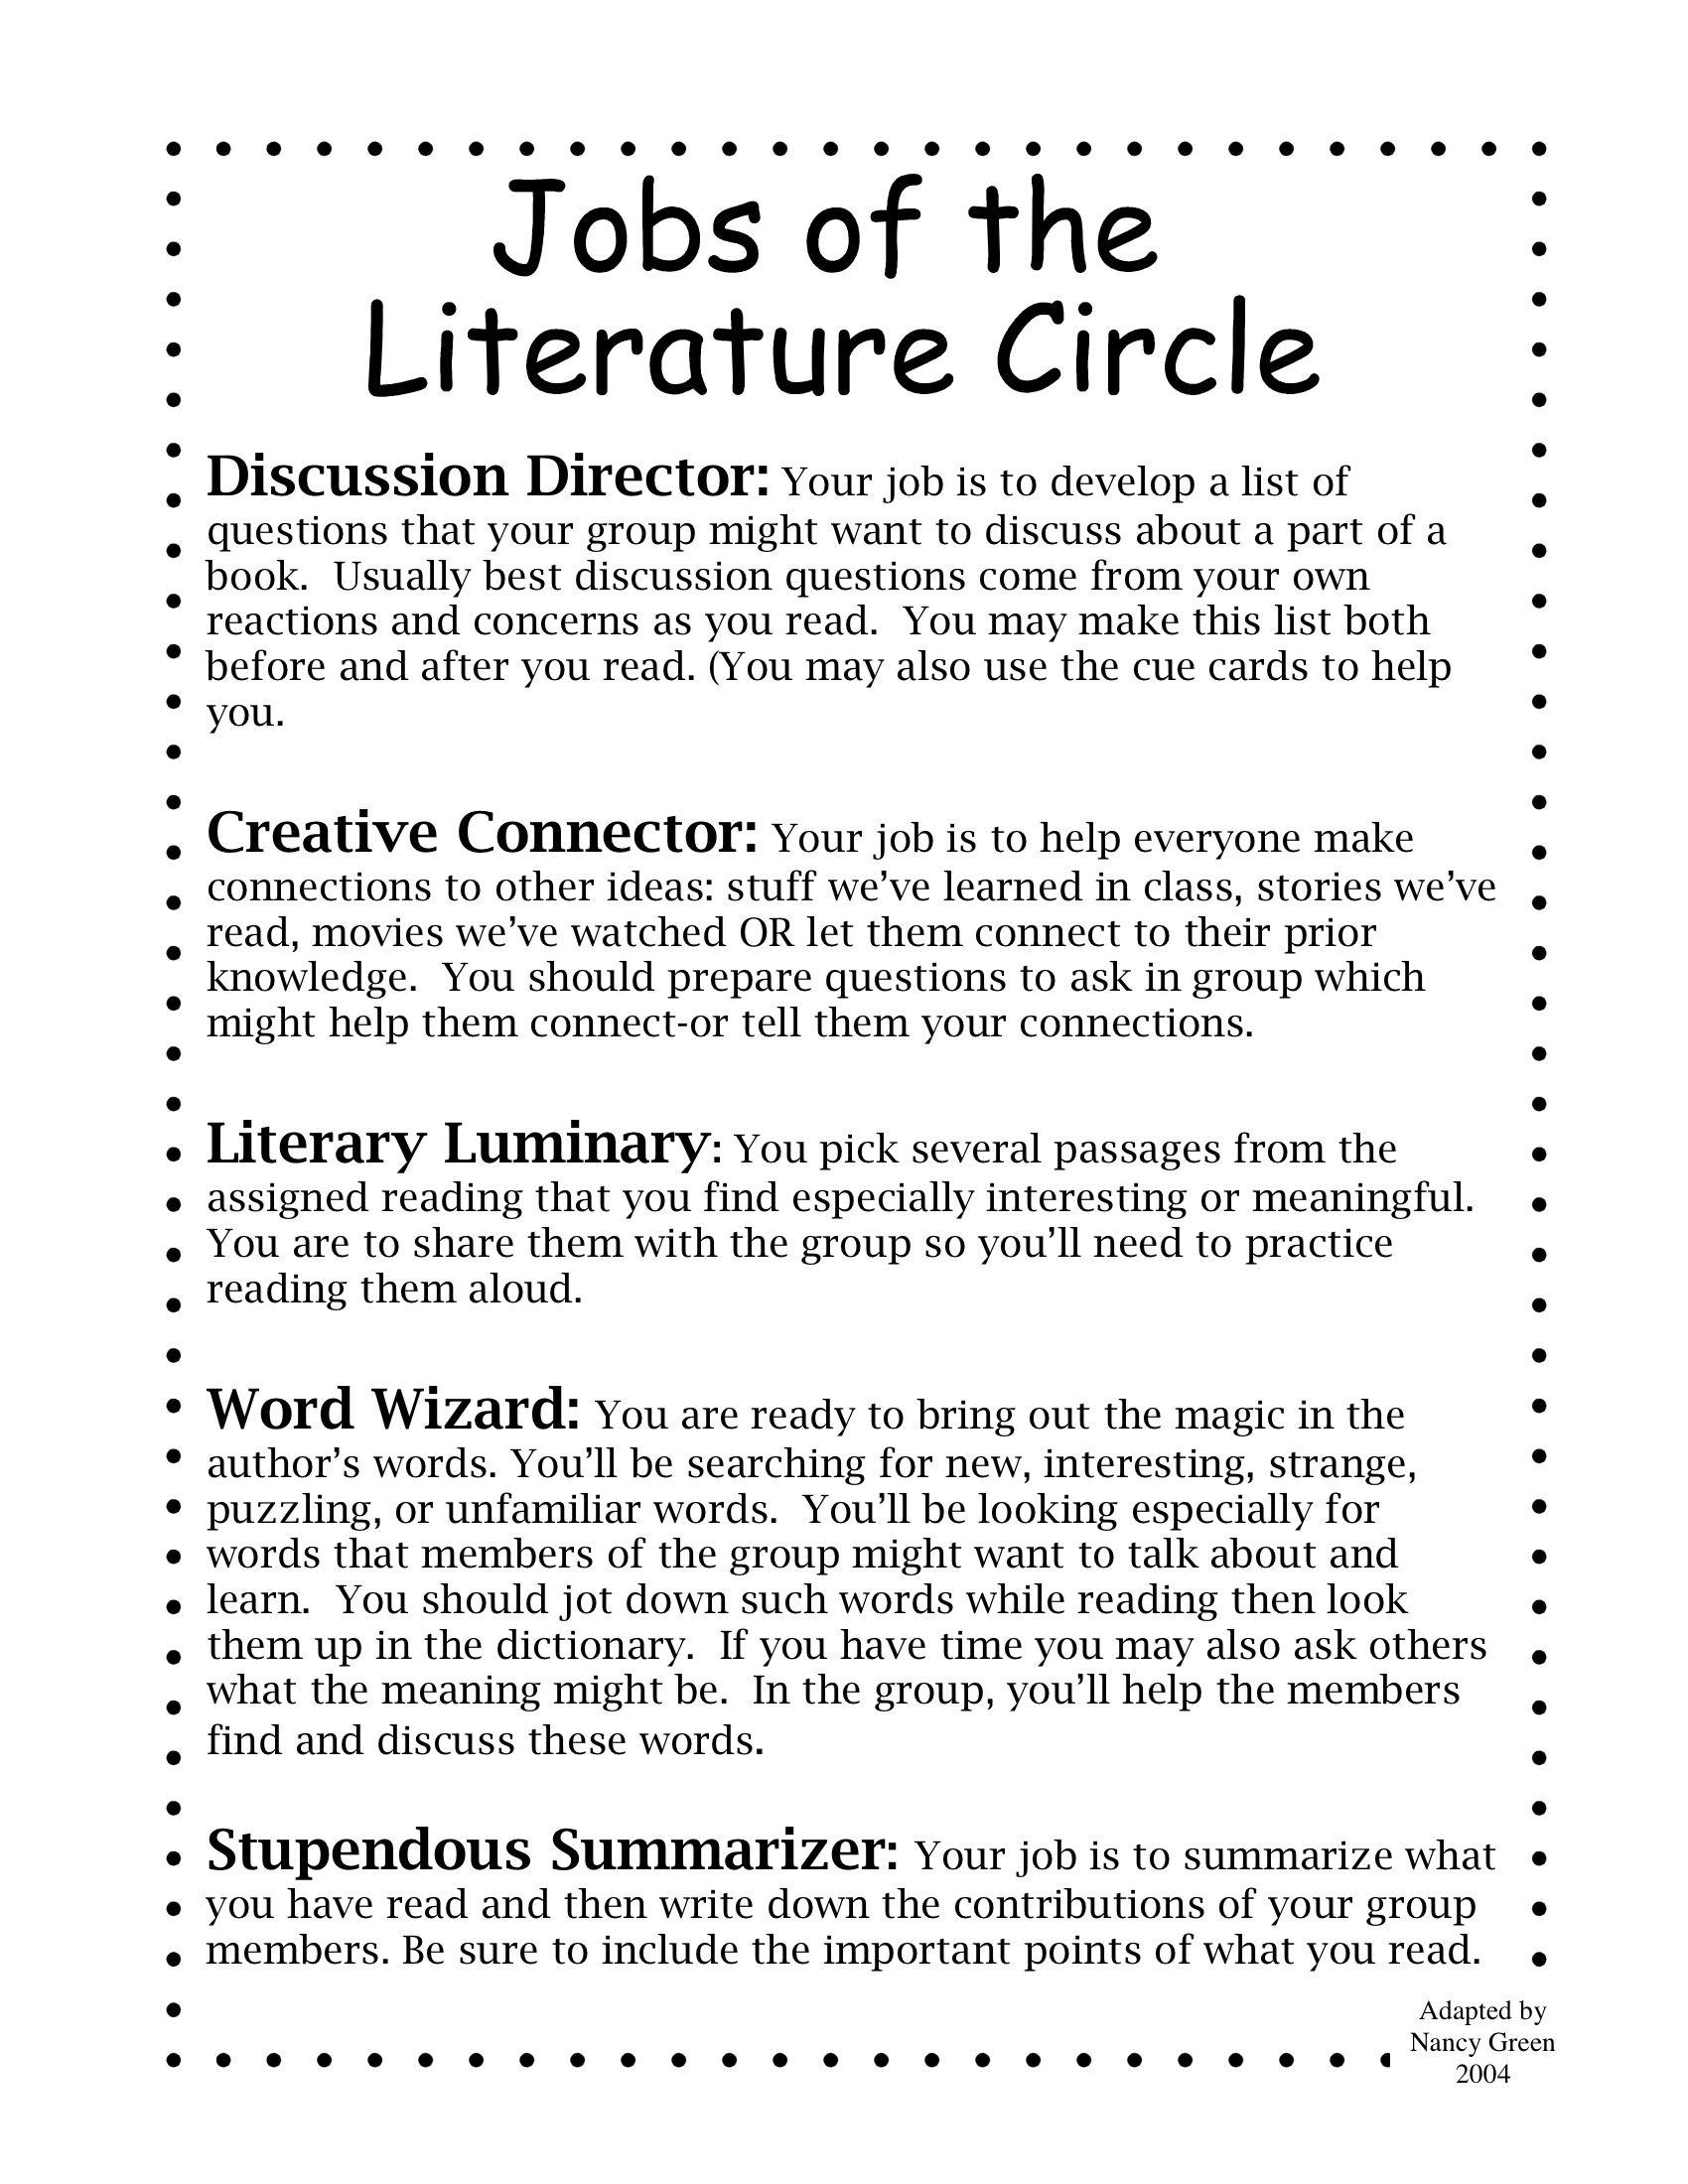 Literature Circle Jobs Stupendous Summarizer Is Better Than Artful Artist